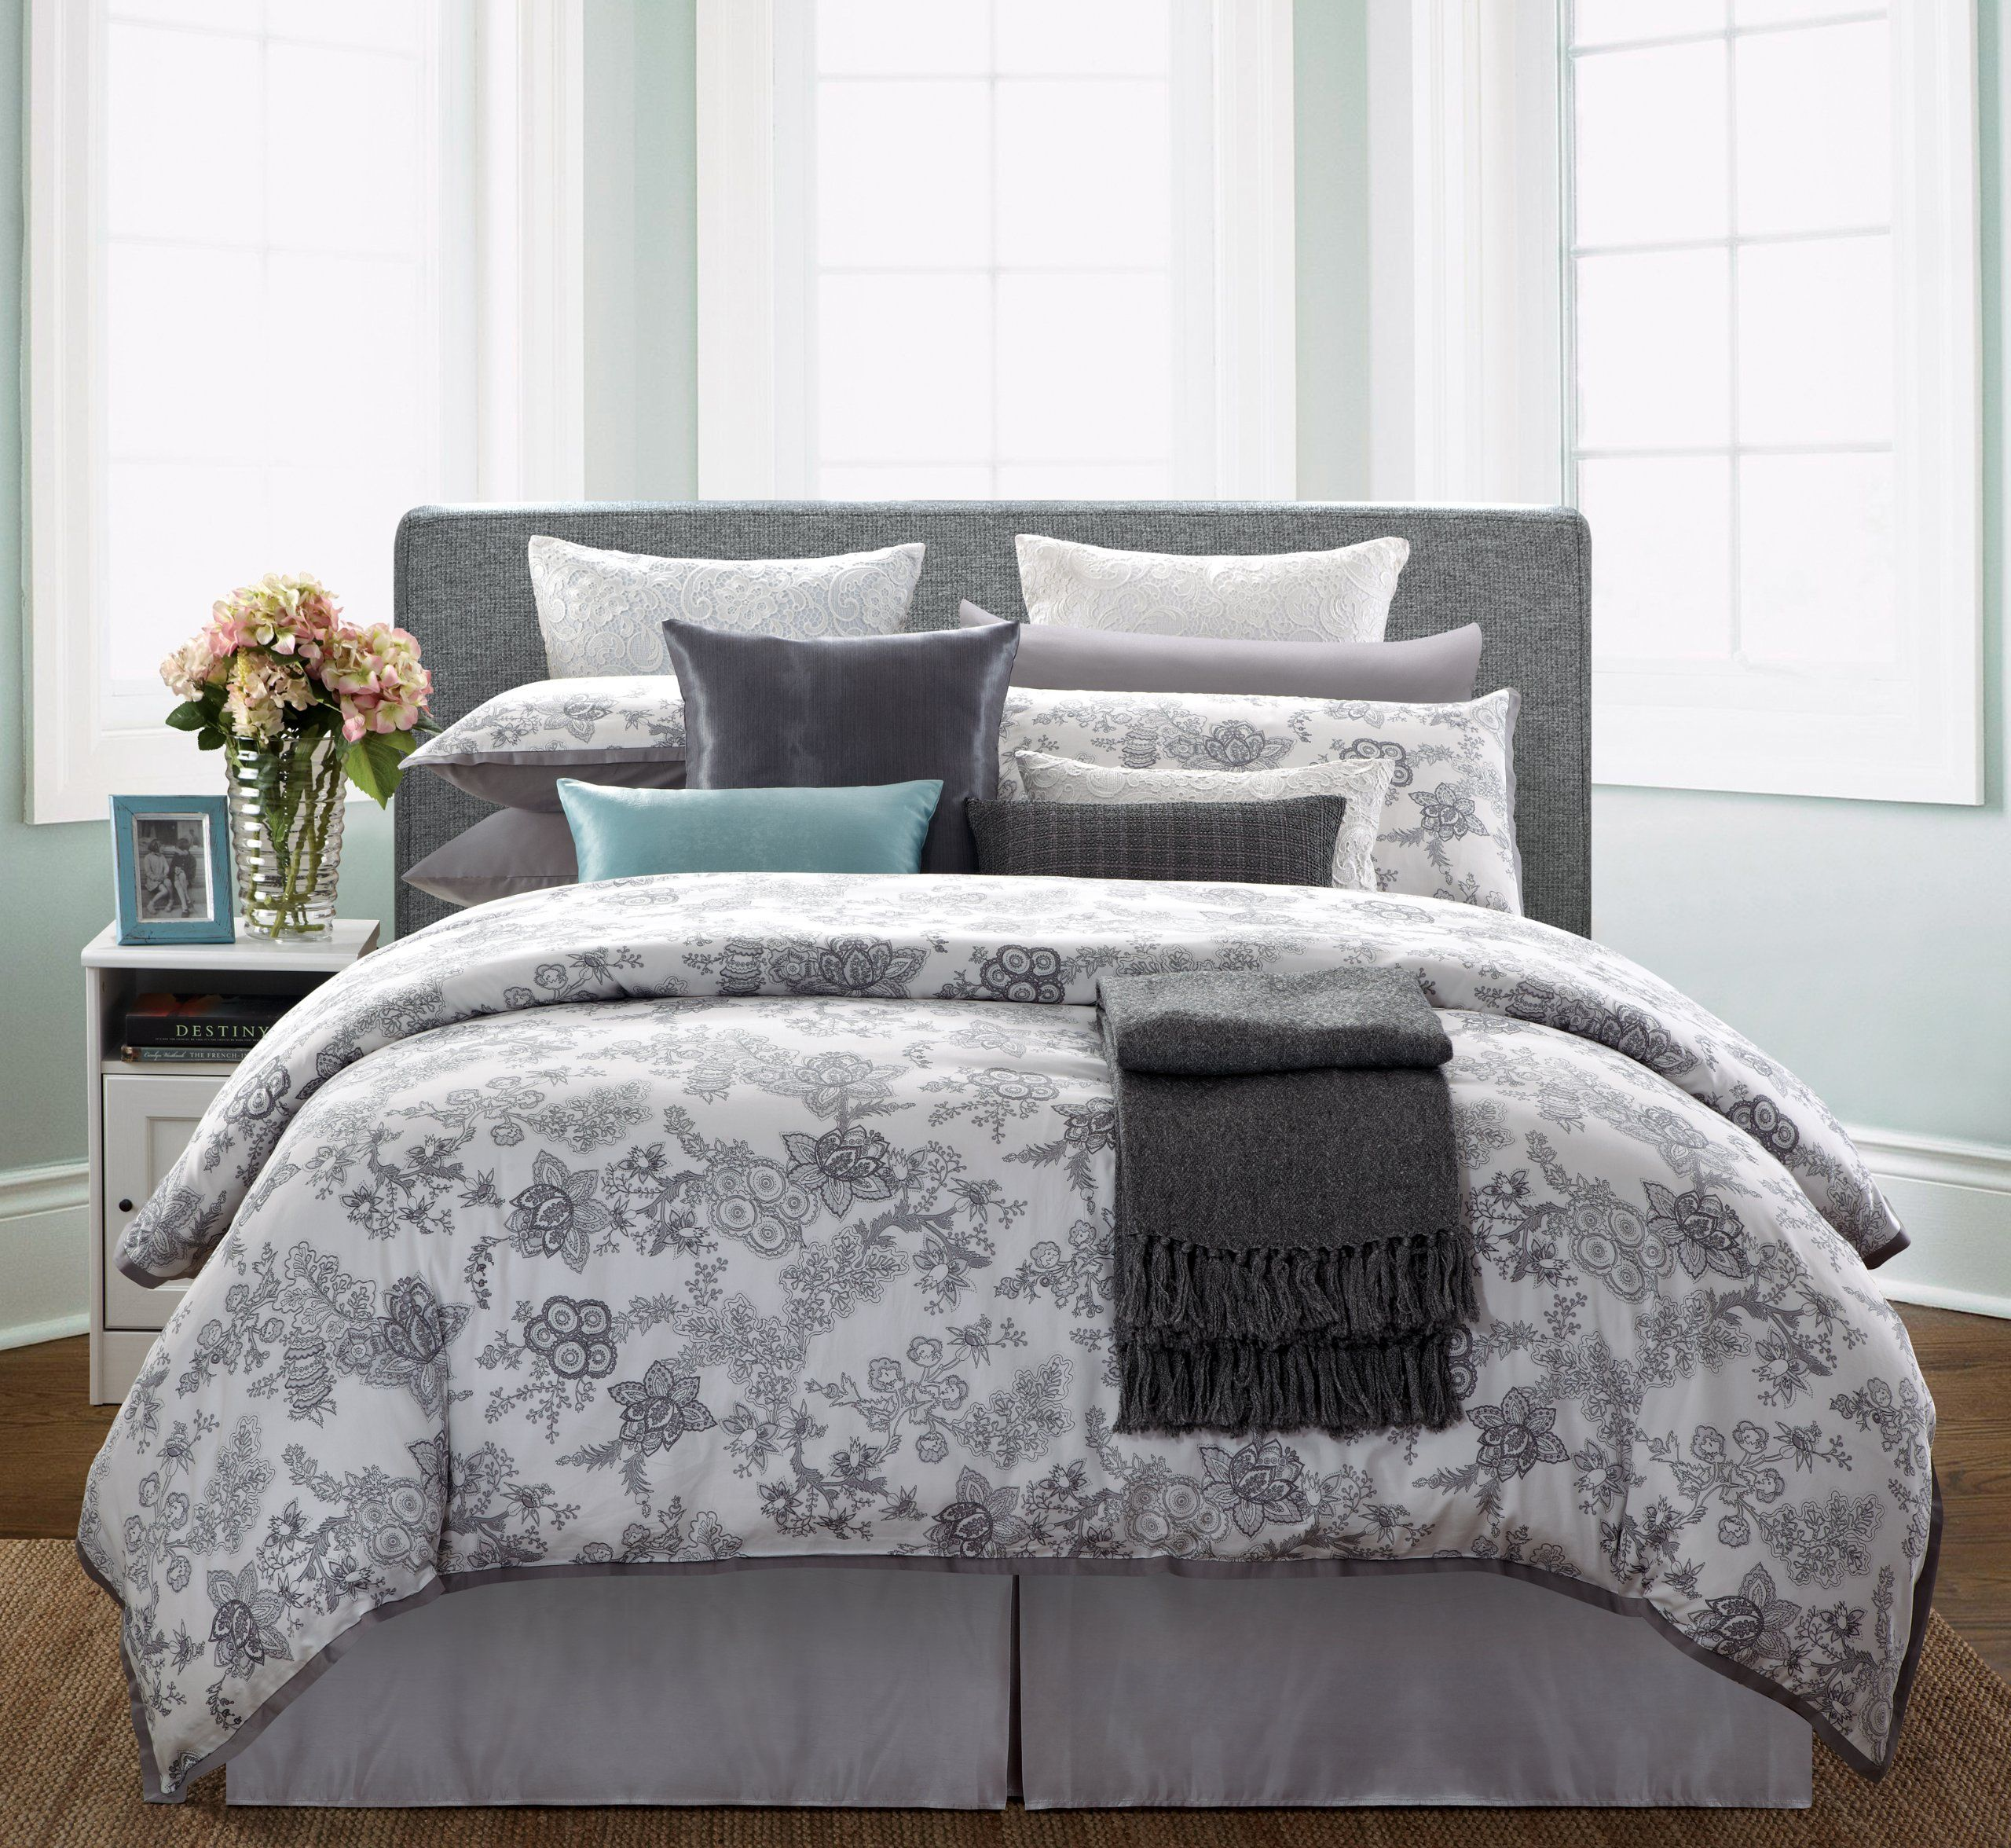 ASTON 8 PIECE COMFORTER SET BLACK TWIN Comforter sets